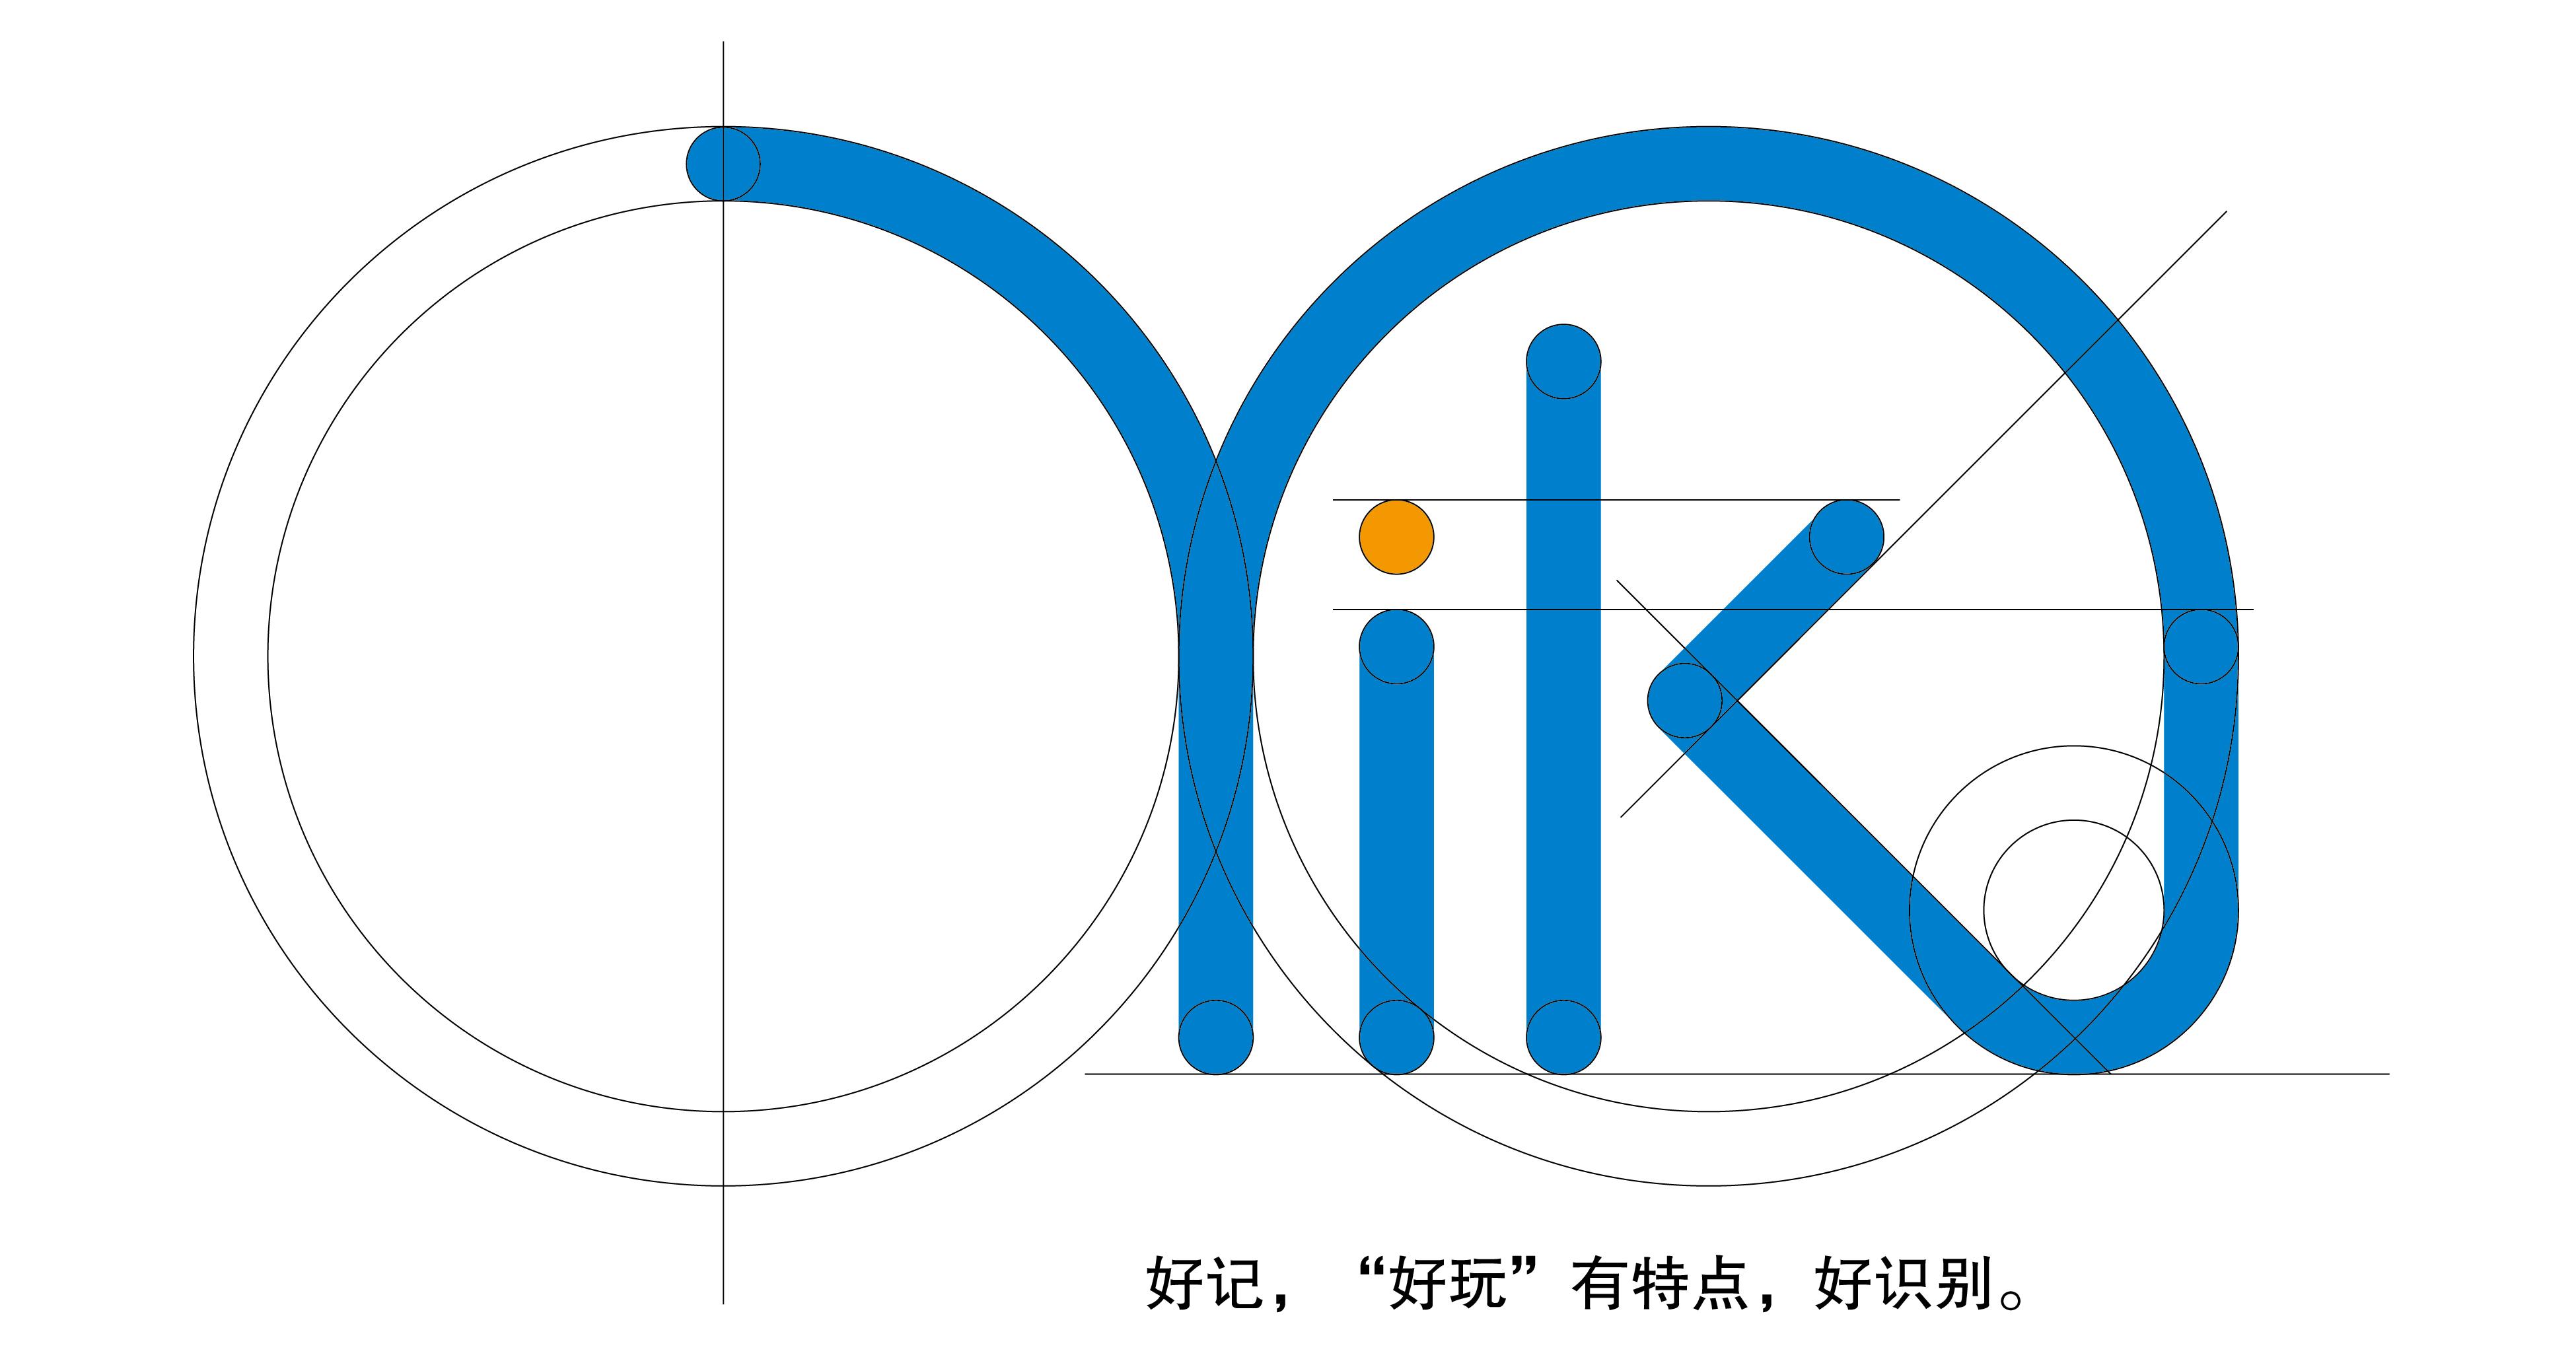 eekoo壹酷 logo 设计